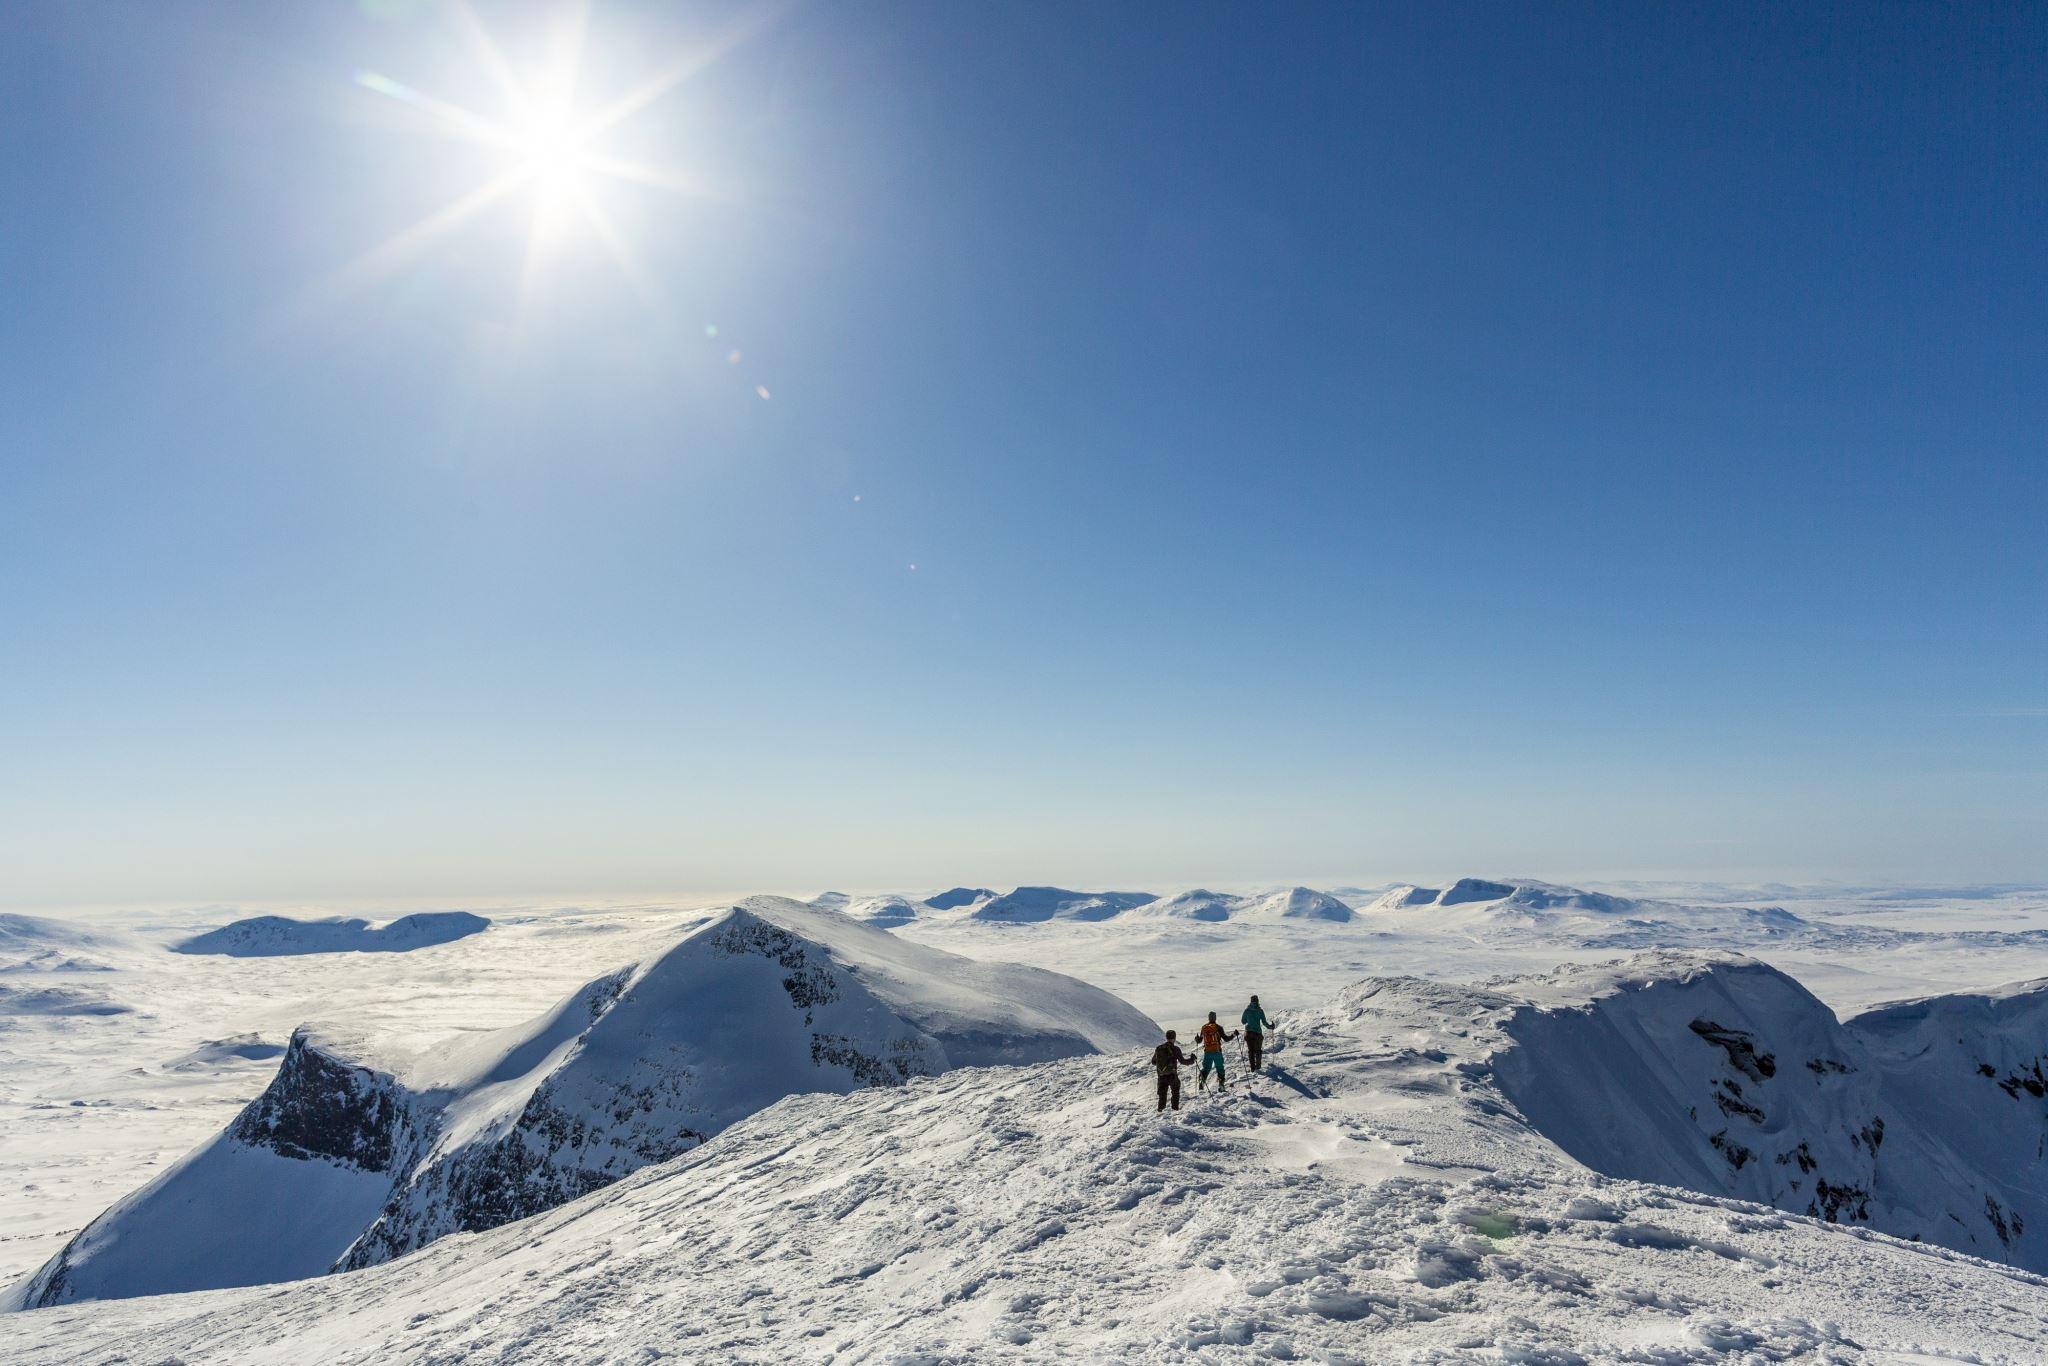 Helags - Guidad topptur (vinter)